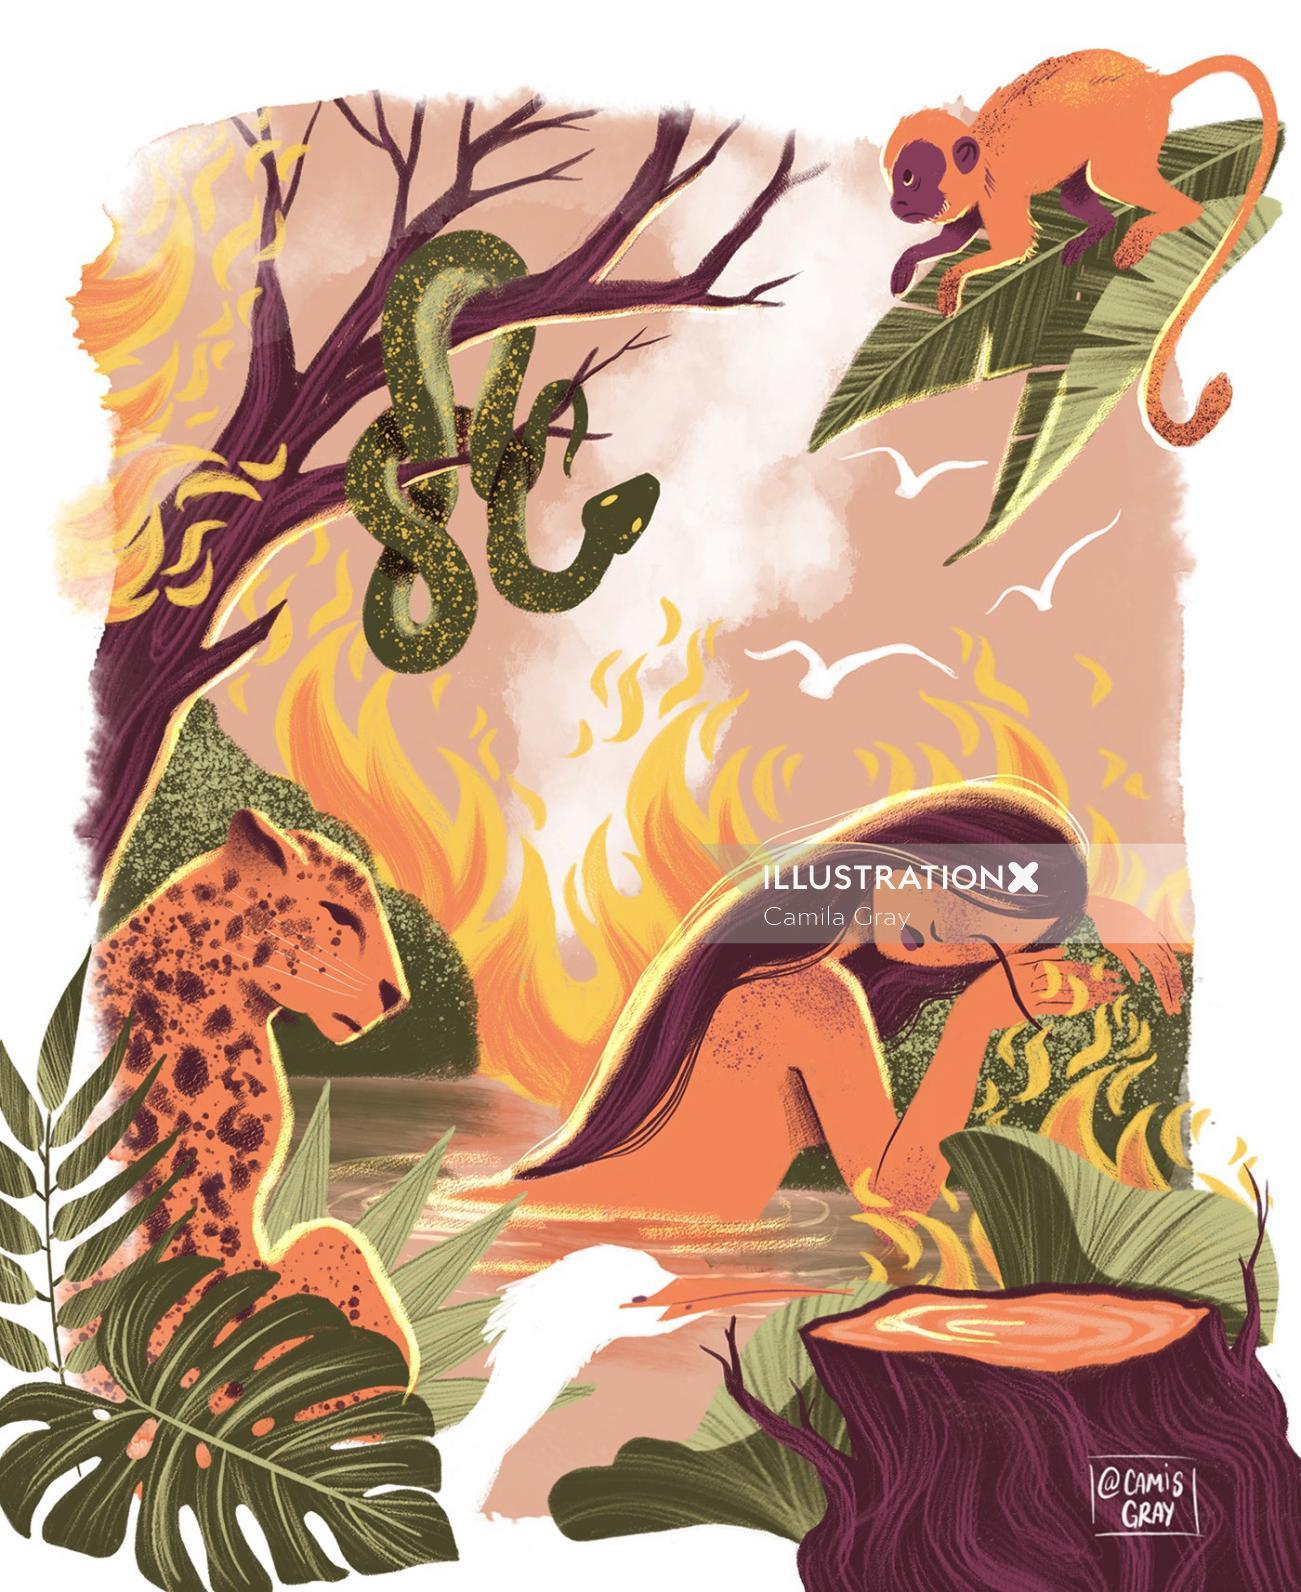 Conceptual illustration on wild life